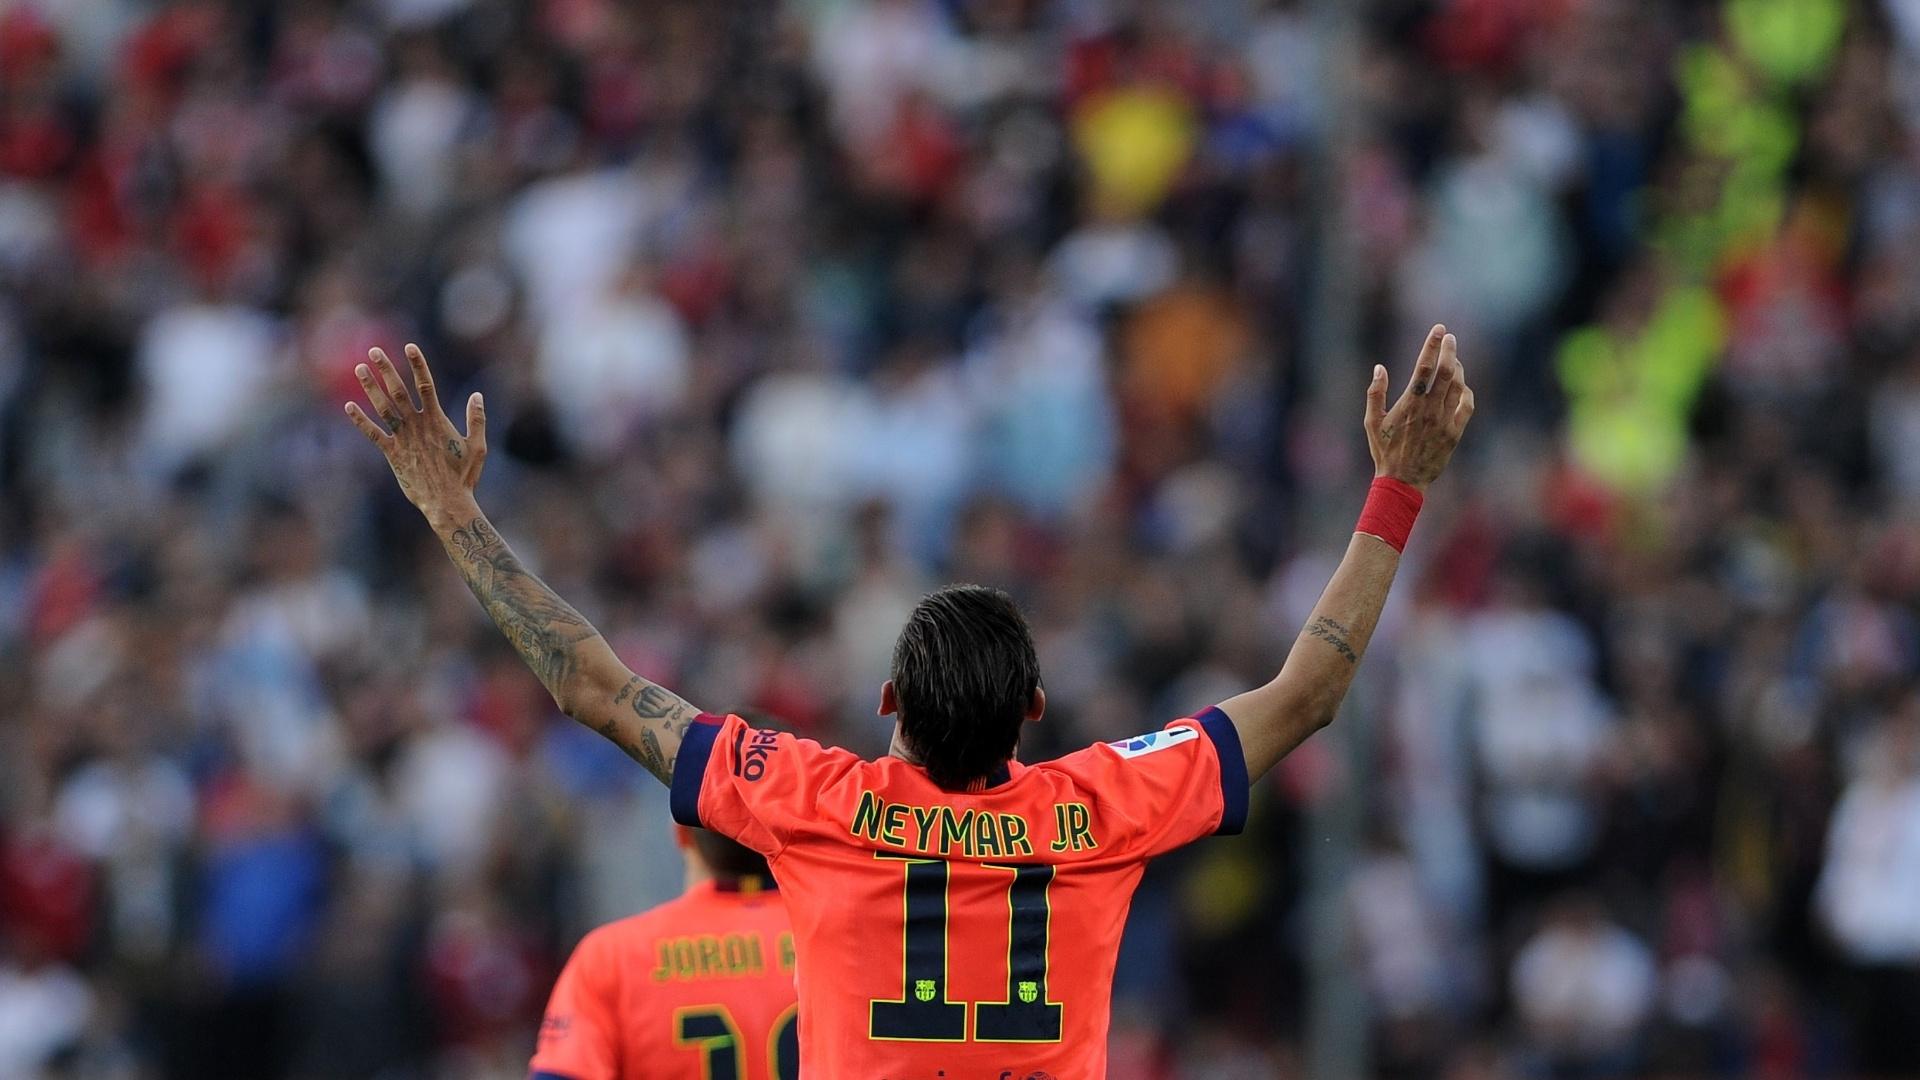 Neymar comemora gol de falta marcado na partida Barcelona e Sevilla, no Campeonato Espanhol